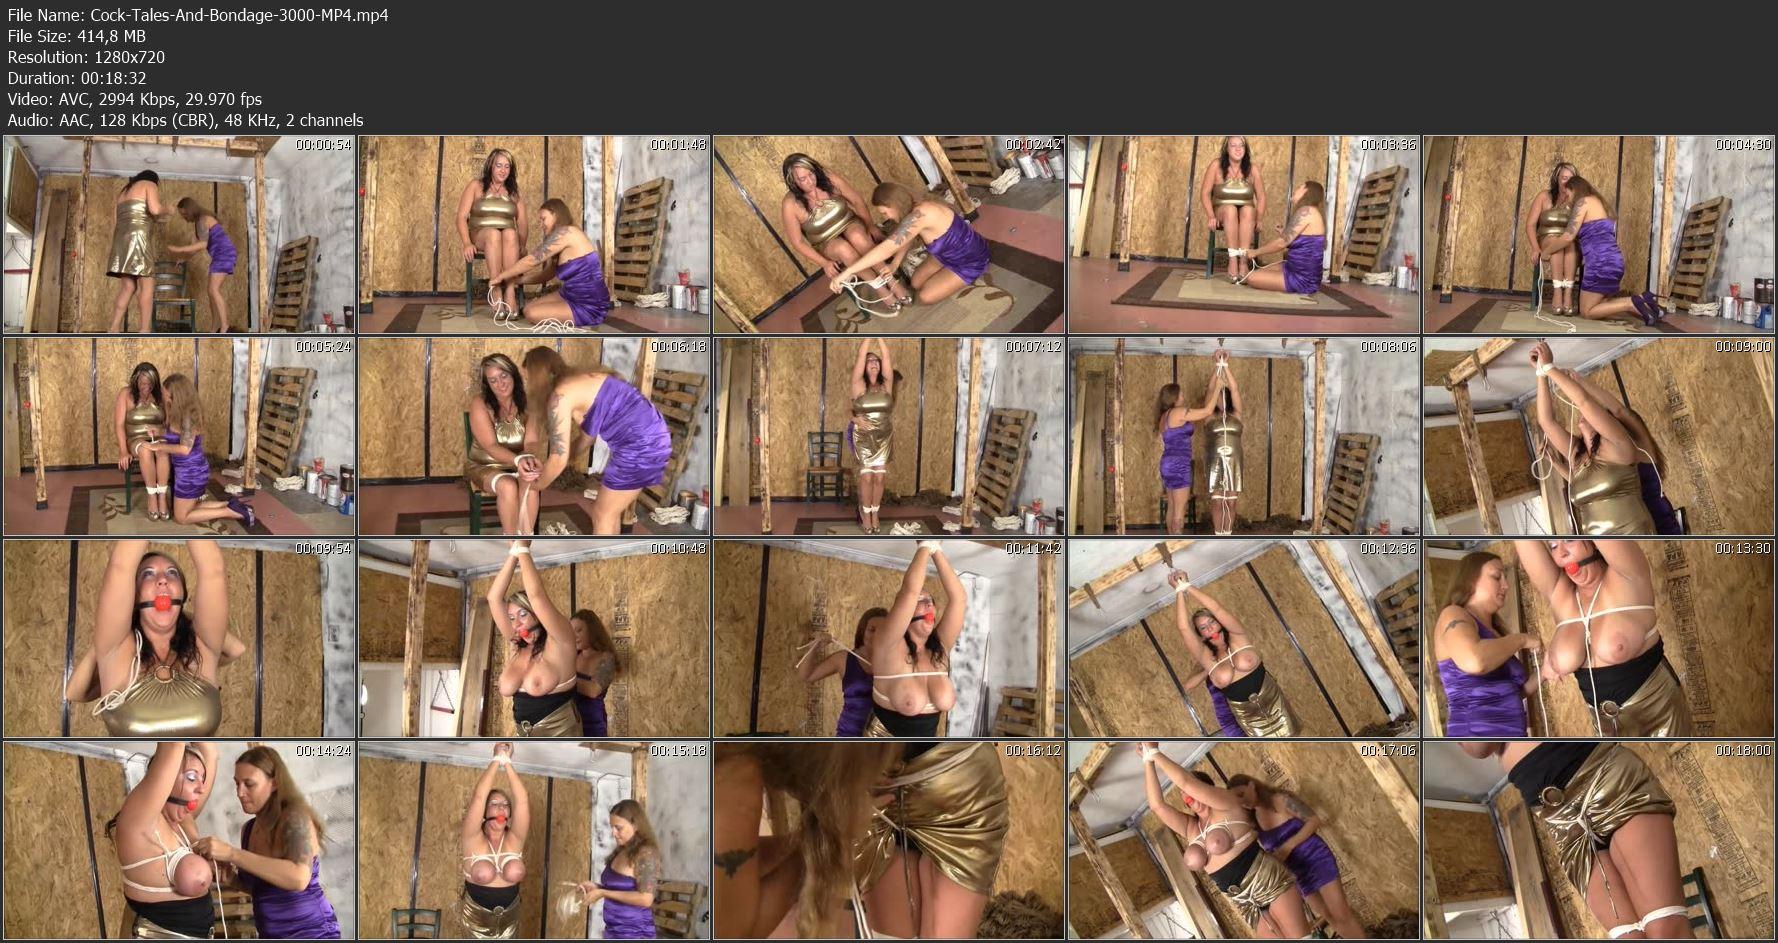 cock-tales-and-bondage-3000-mp4__image_3_.jpg